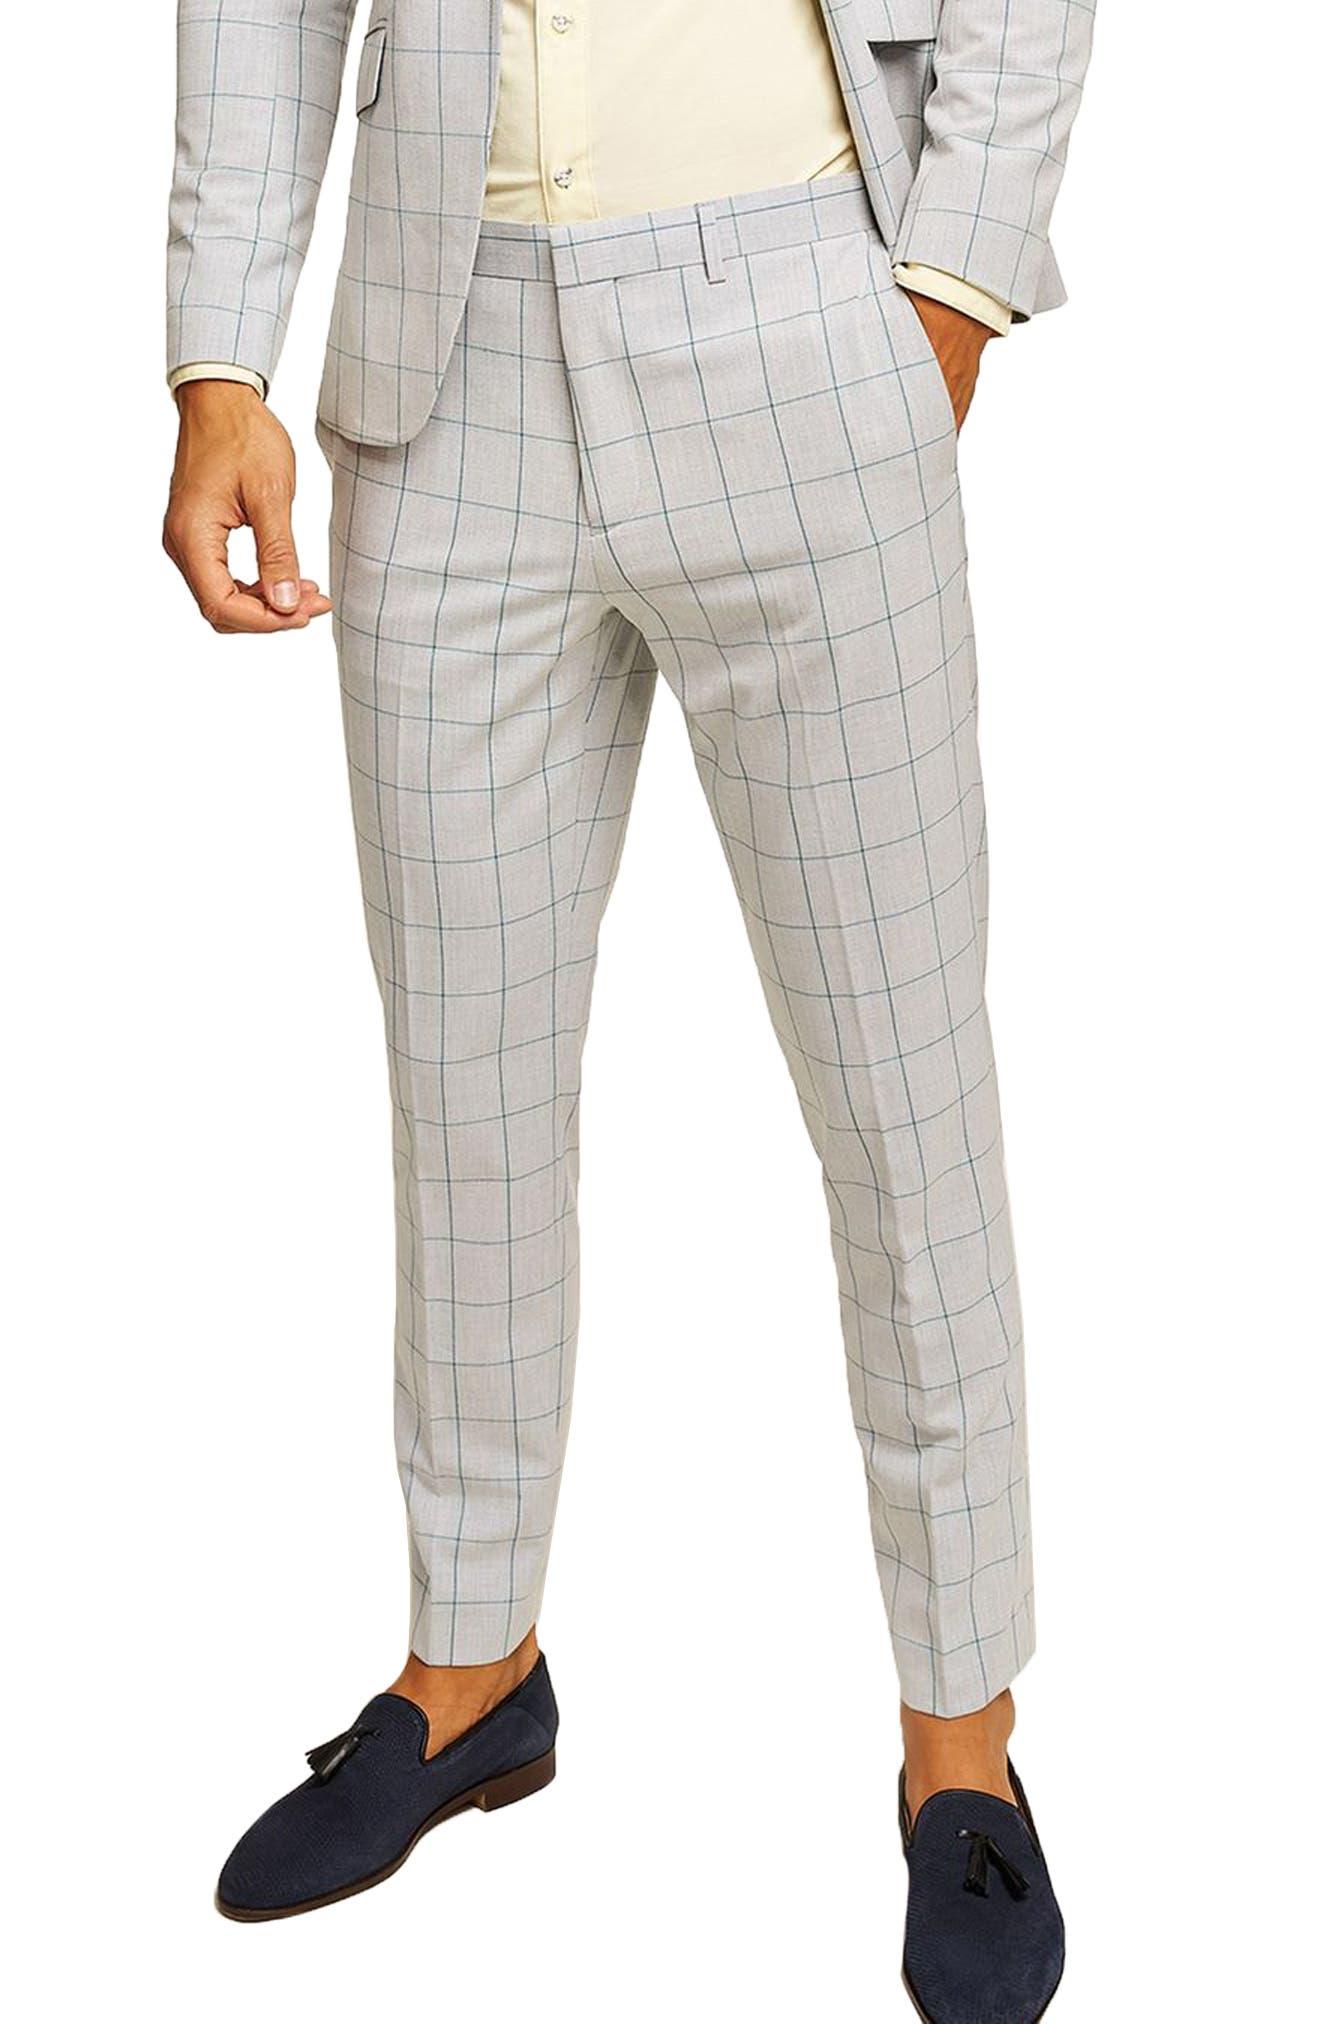 TOPMAN, Muscle Fit Check Suit Trousers, Main thumbnail 1, color, 300